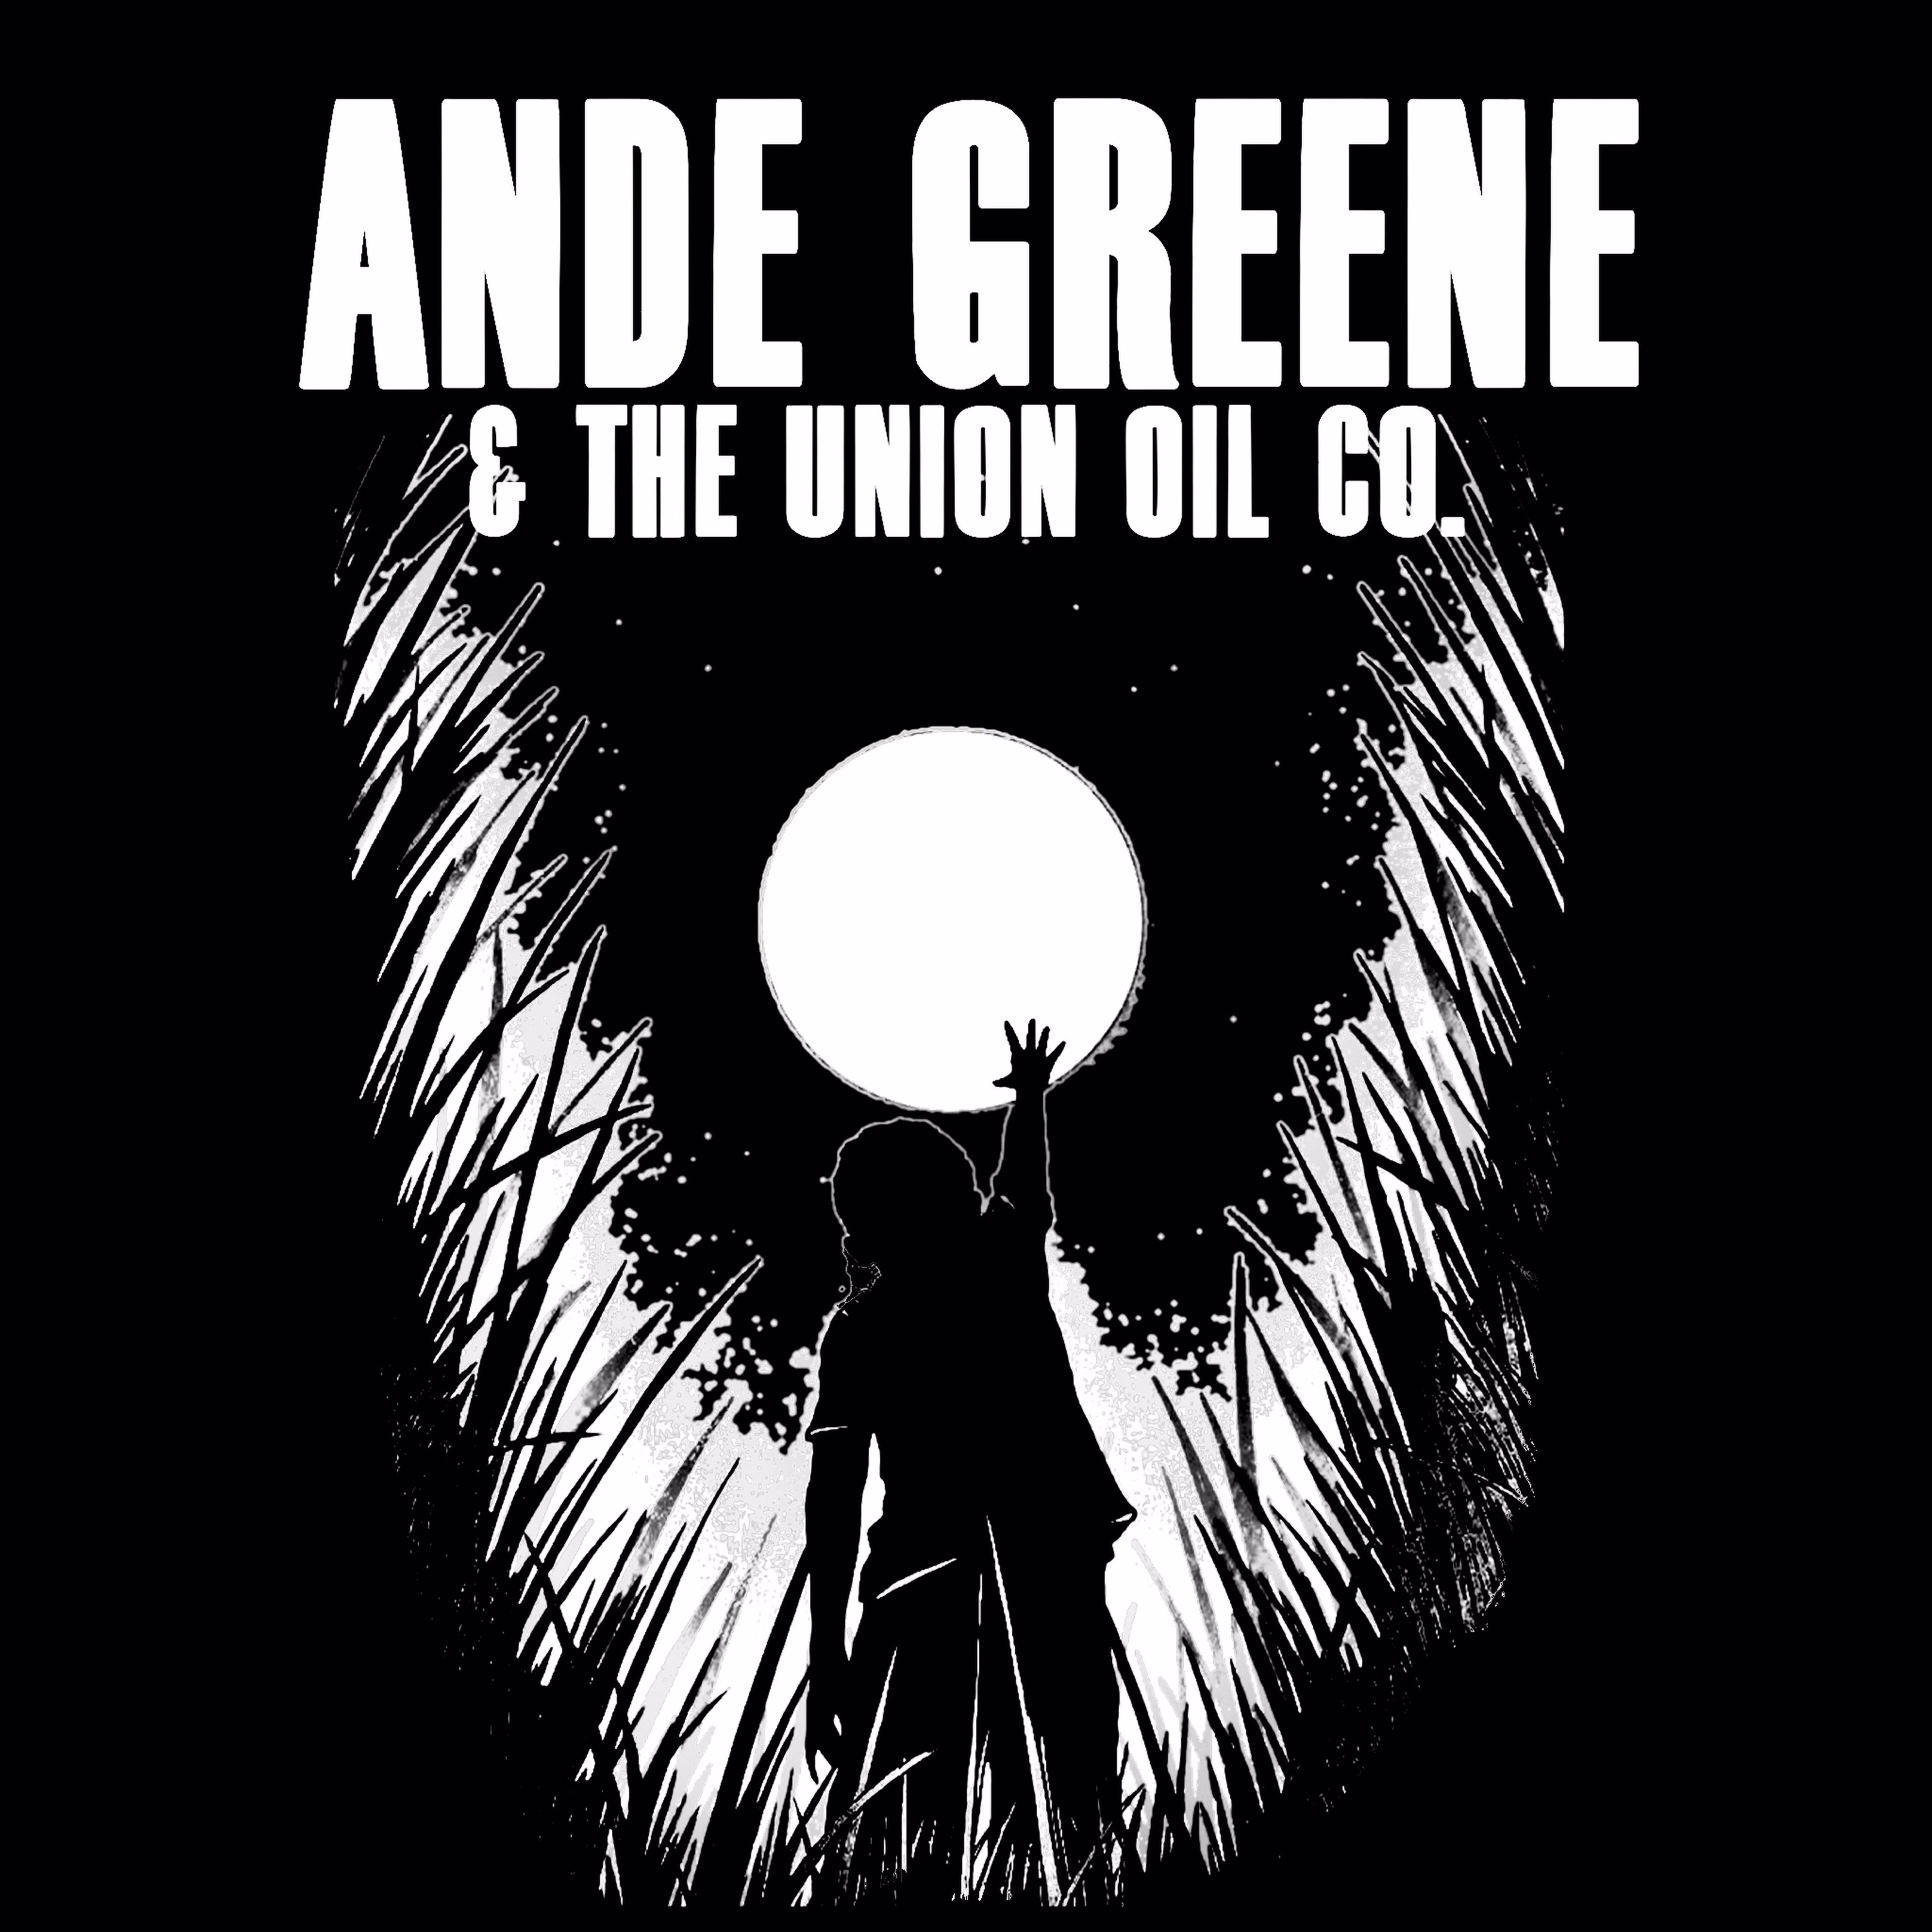 Ande Greene & The Union Oil Co.